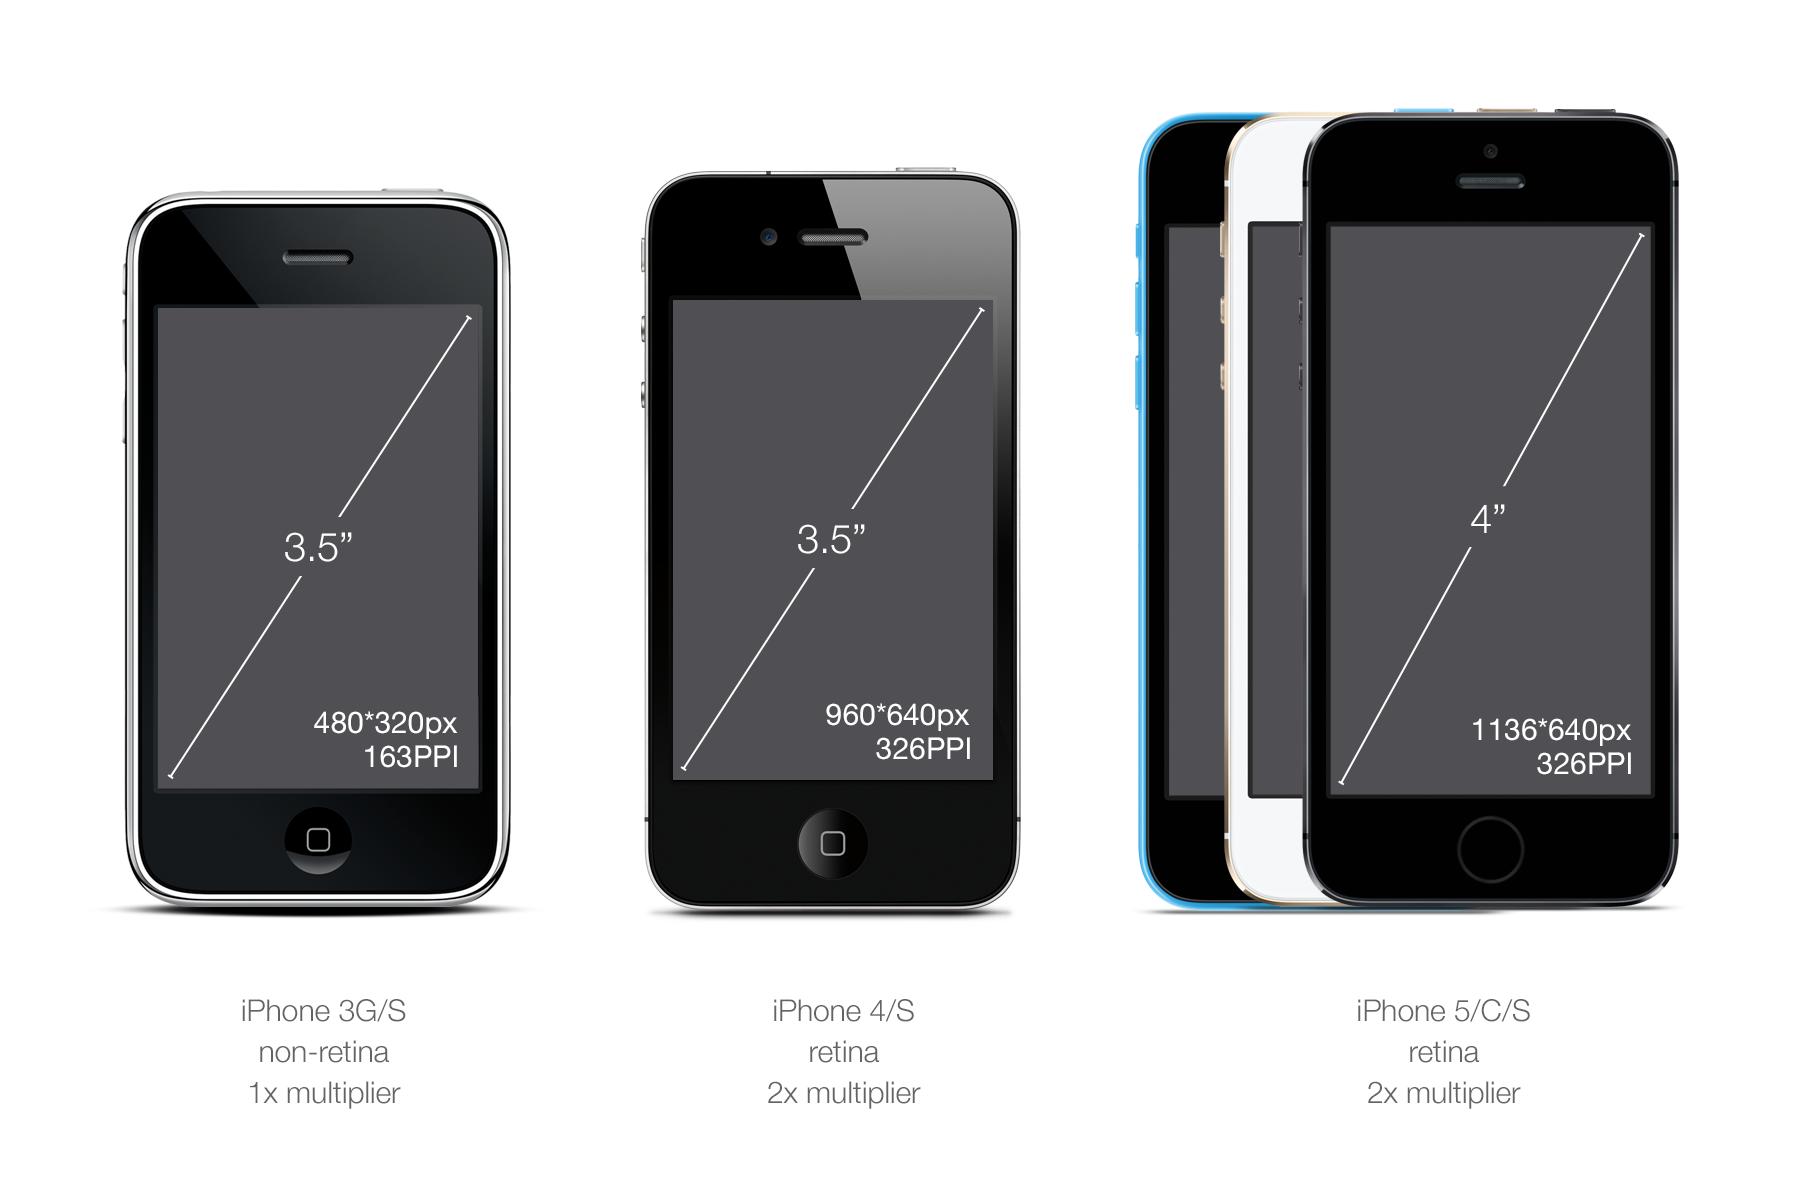 designer s guide to dpi rh sebastien gabriel com iPod 3G Specs Adapter for iPod Touch 3G